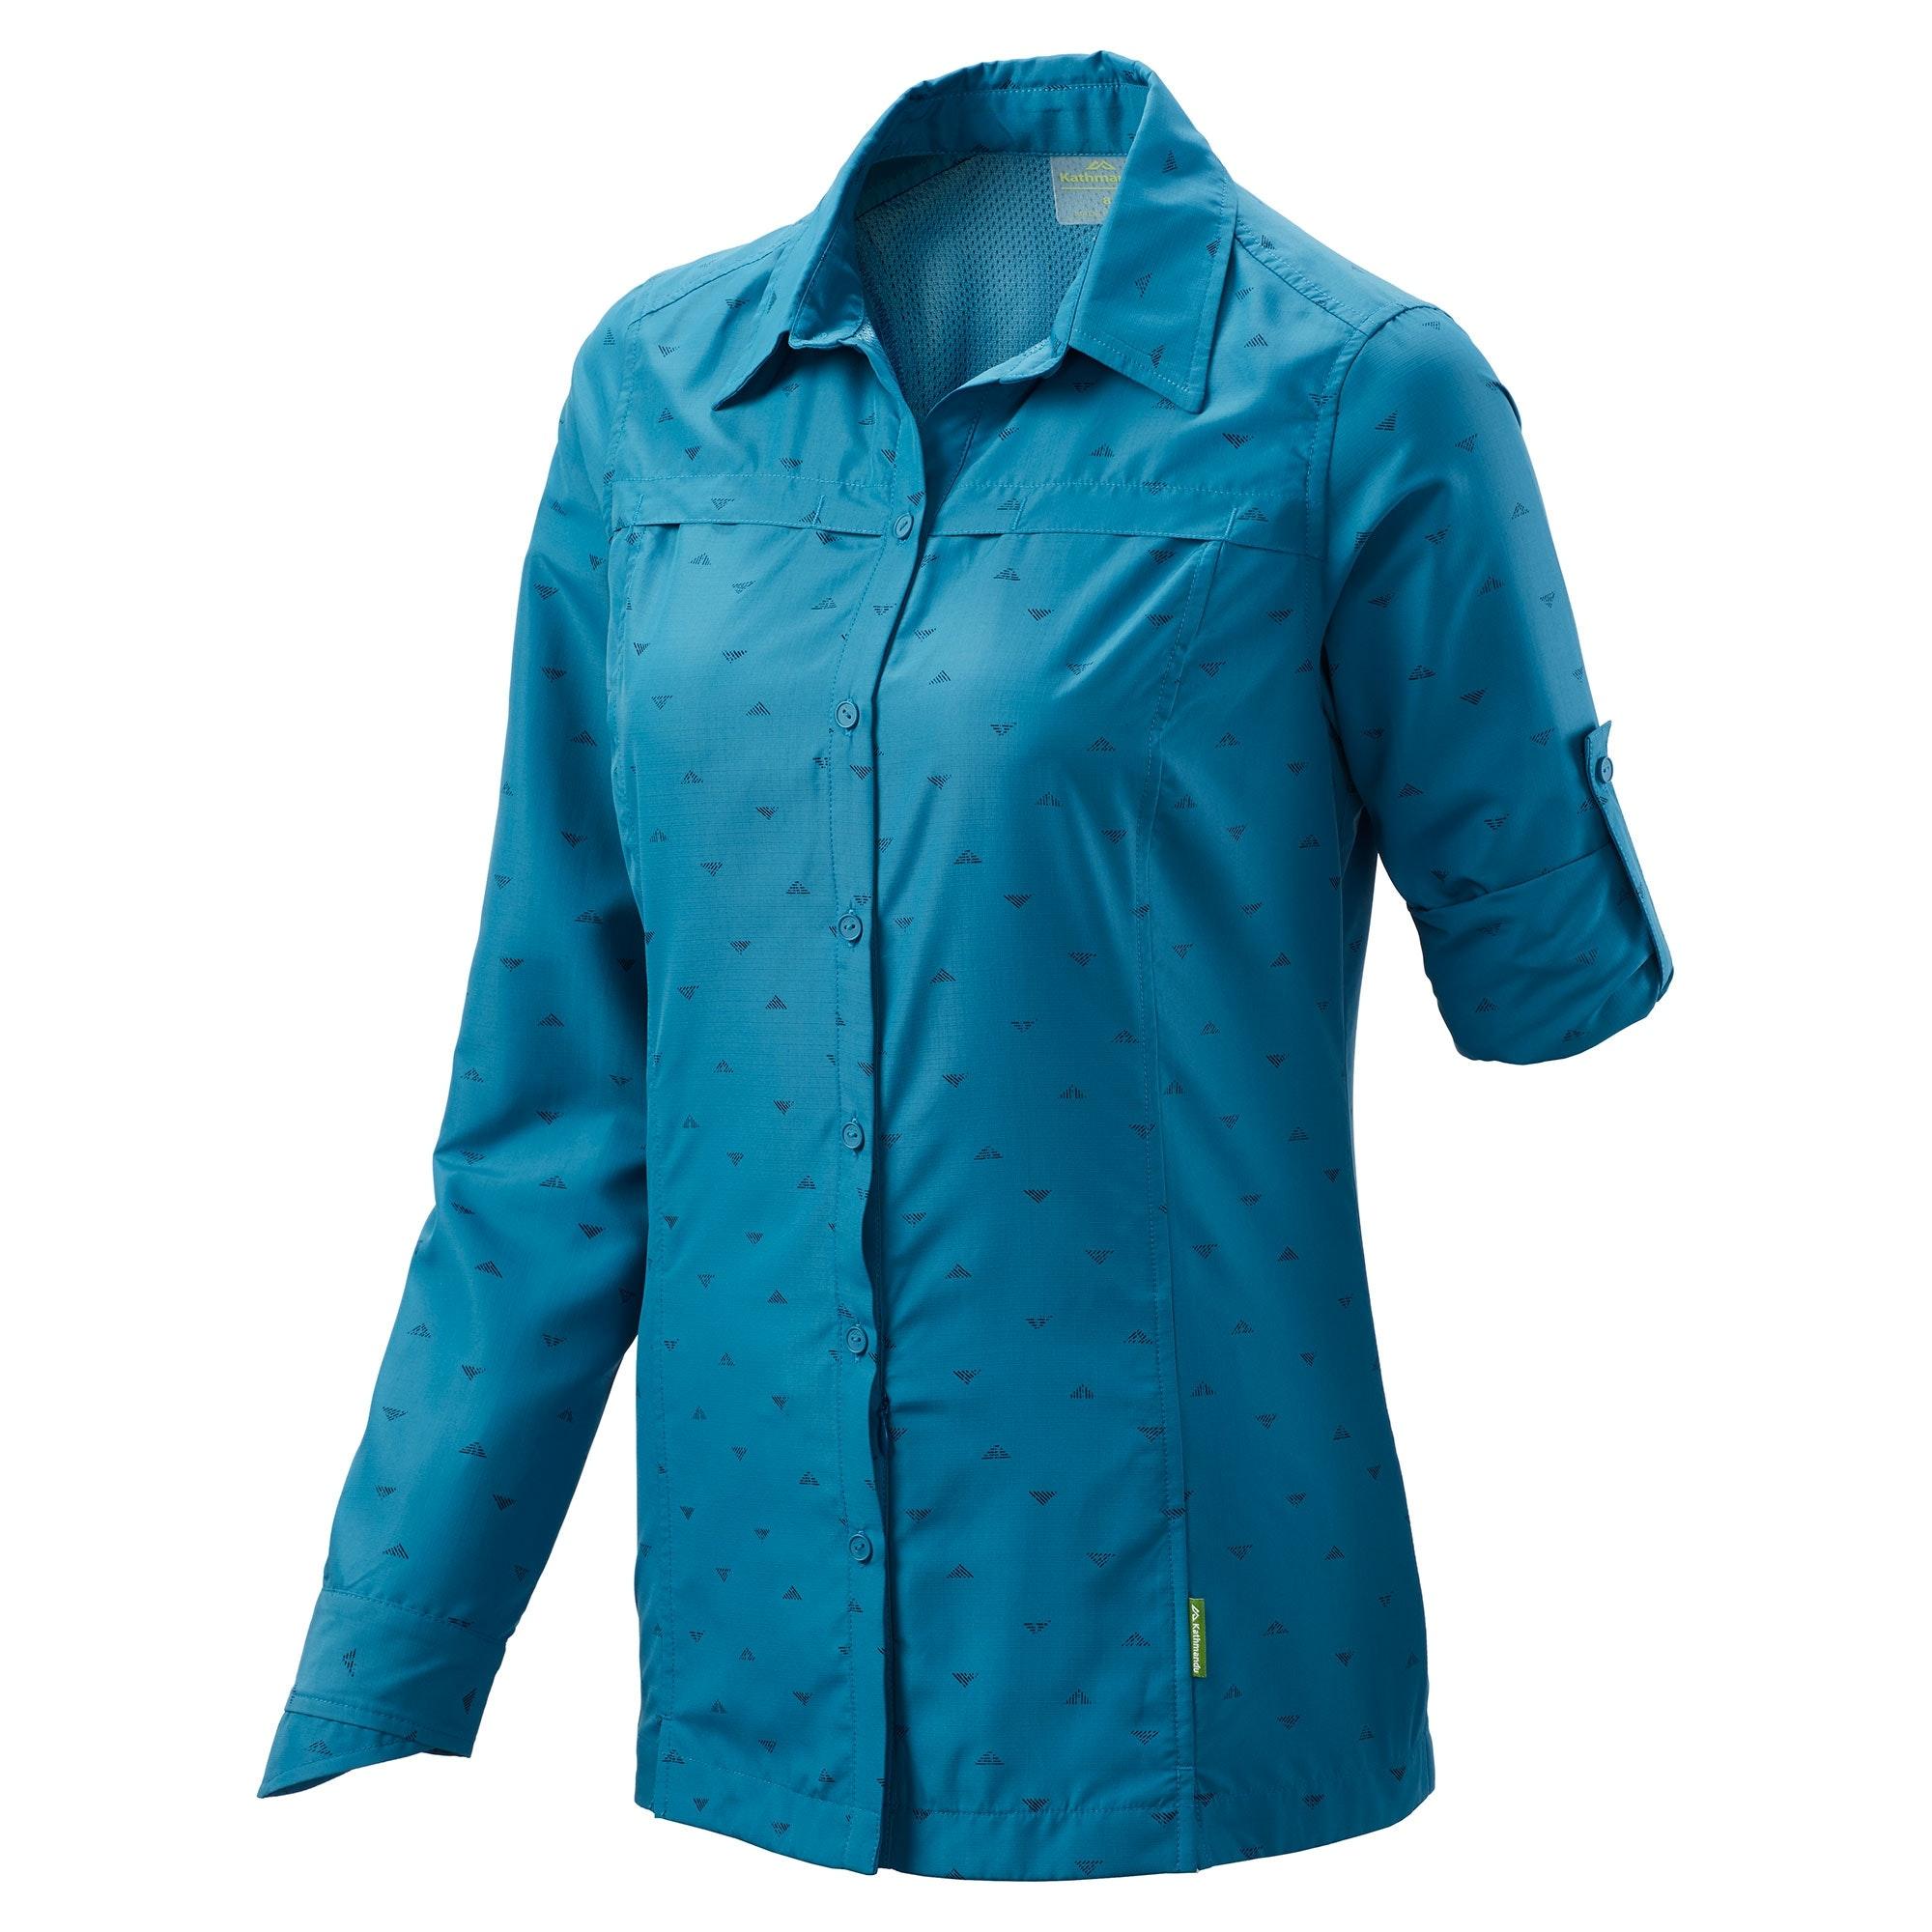 Kathmandu-Tapah-Women-039-s-Long-Sleeve-Quick-Drying-Sun-Protection-Hiking-Shirt-v2